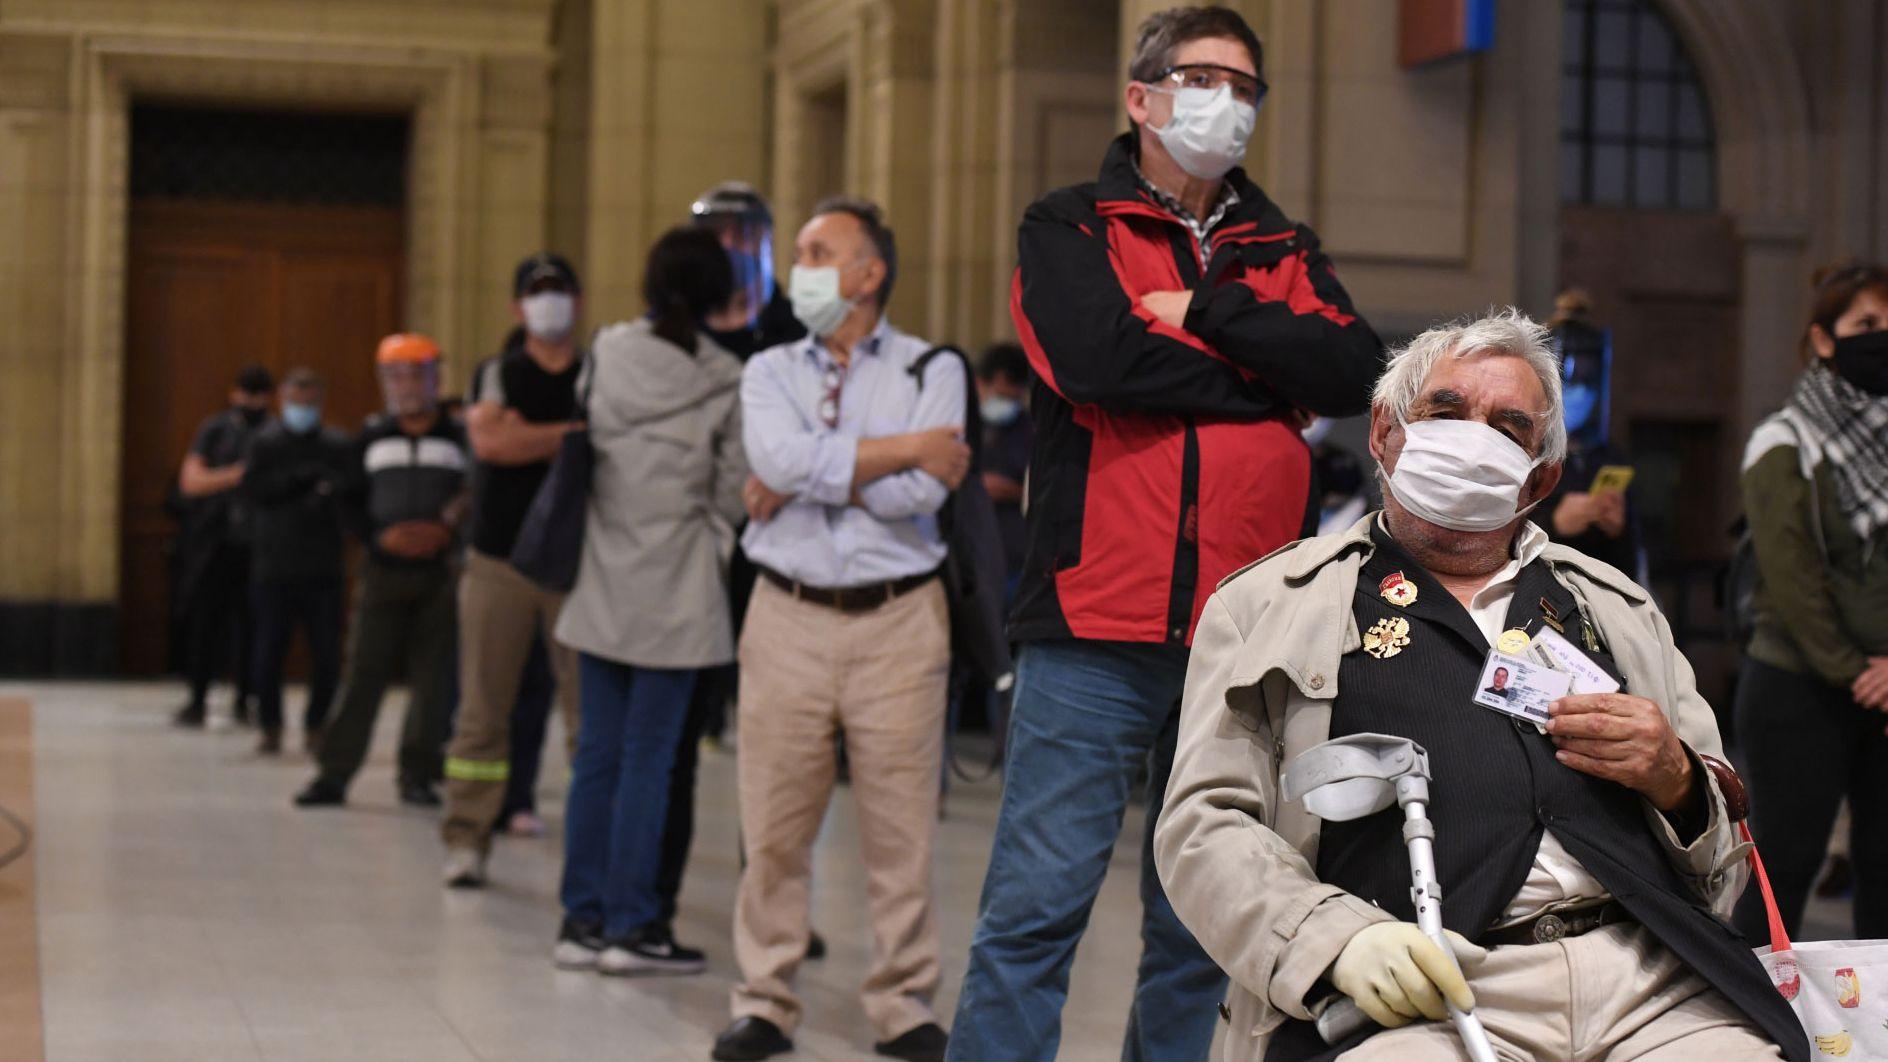 En Argentina se registraron 165 muertes por coronavirus